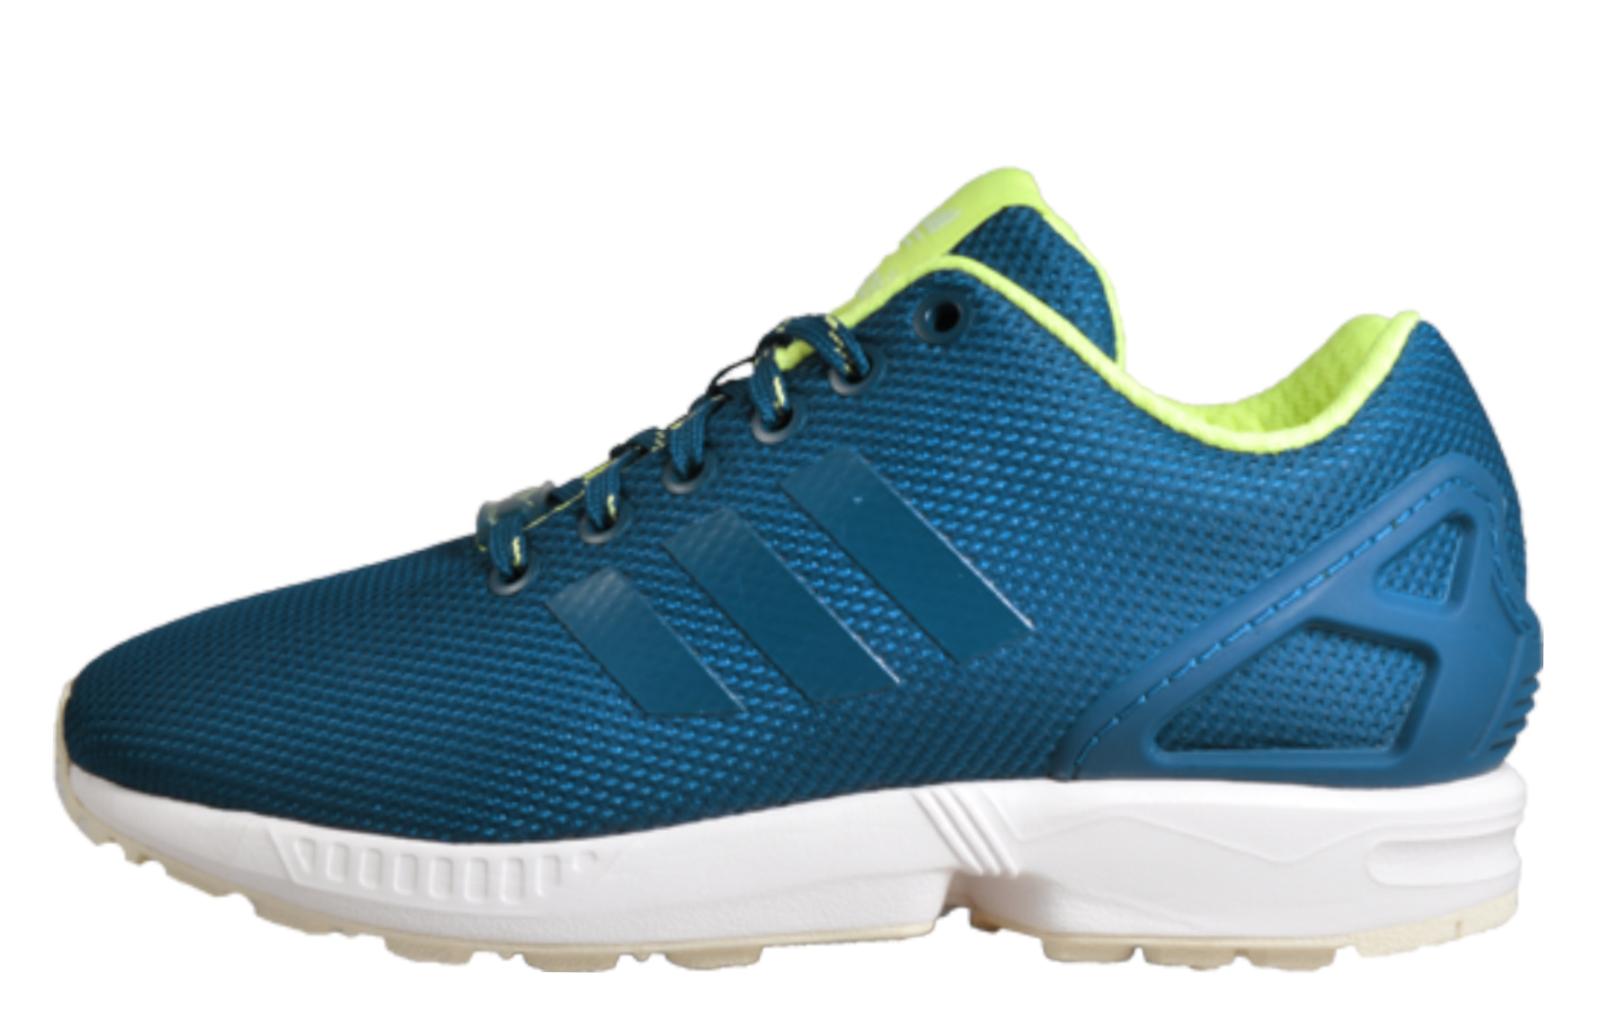 finest selection 4950c 63e28 Adidas Originals ZX Flux Unisex Classic Casual Retro Trainers Blue